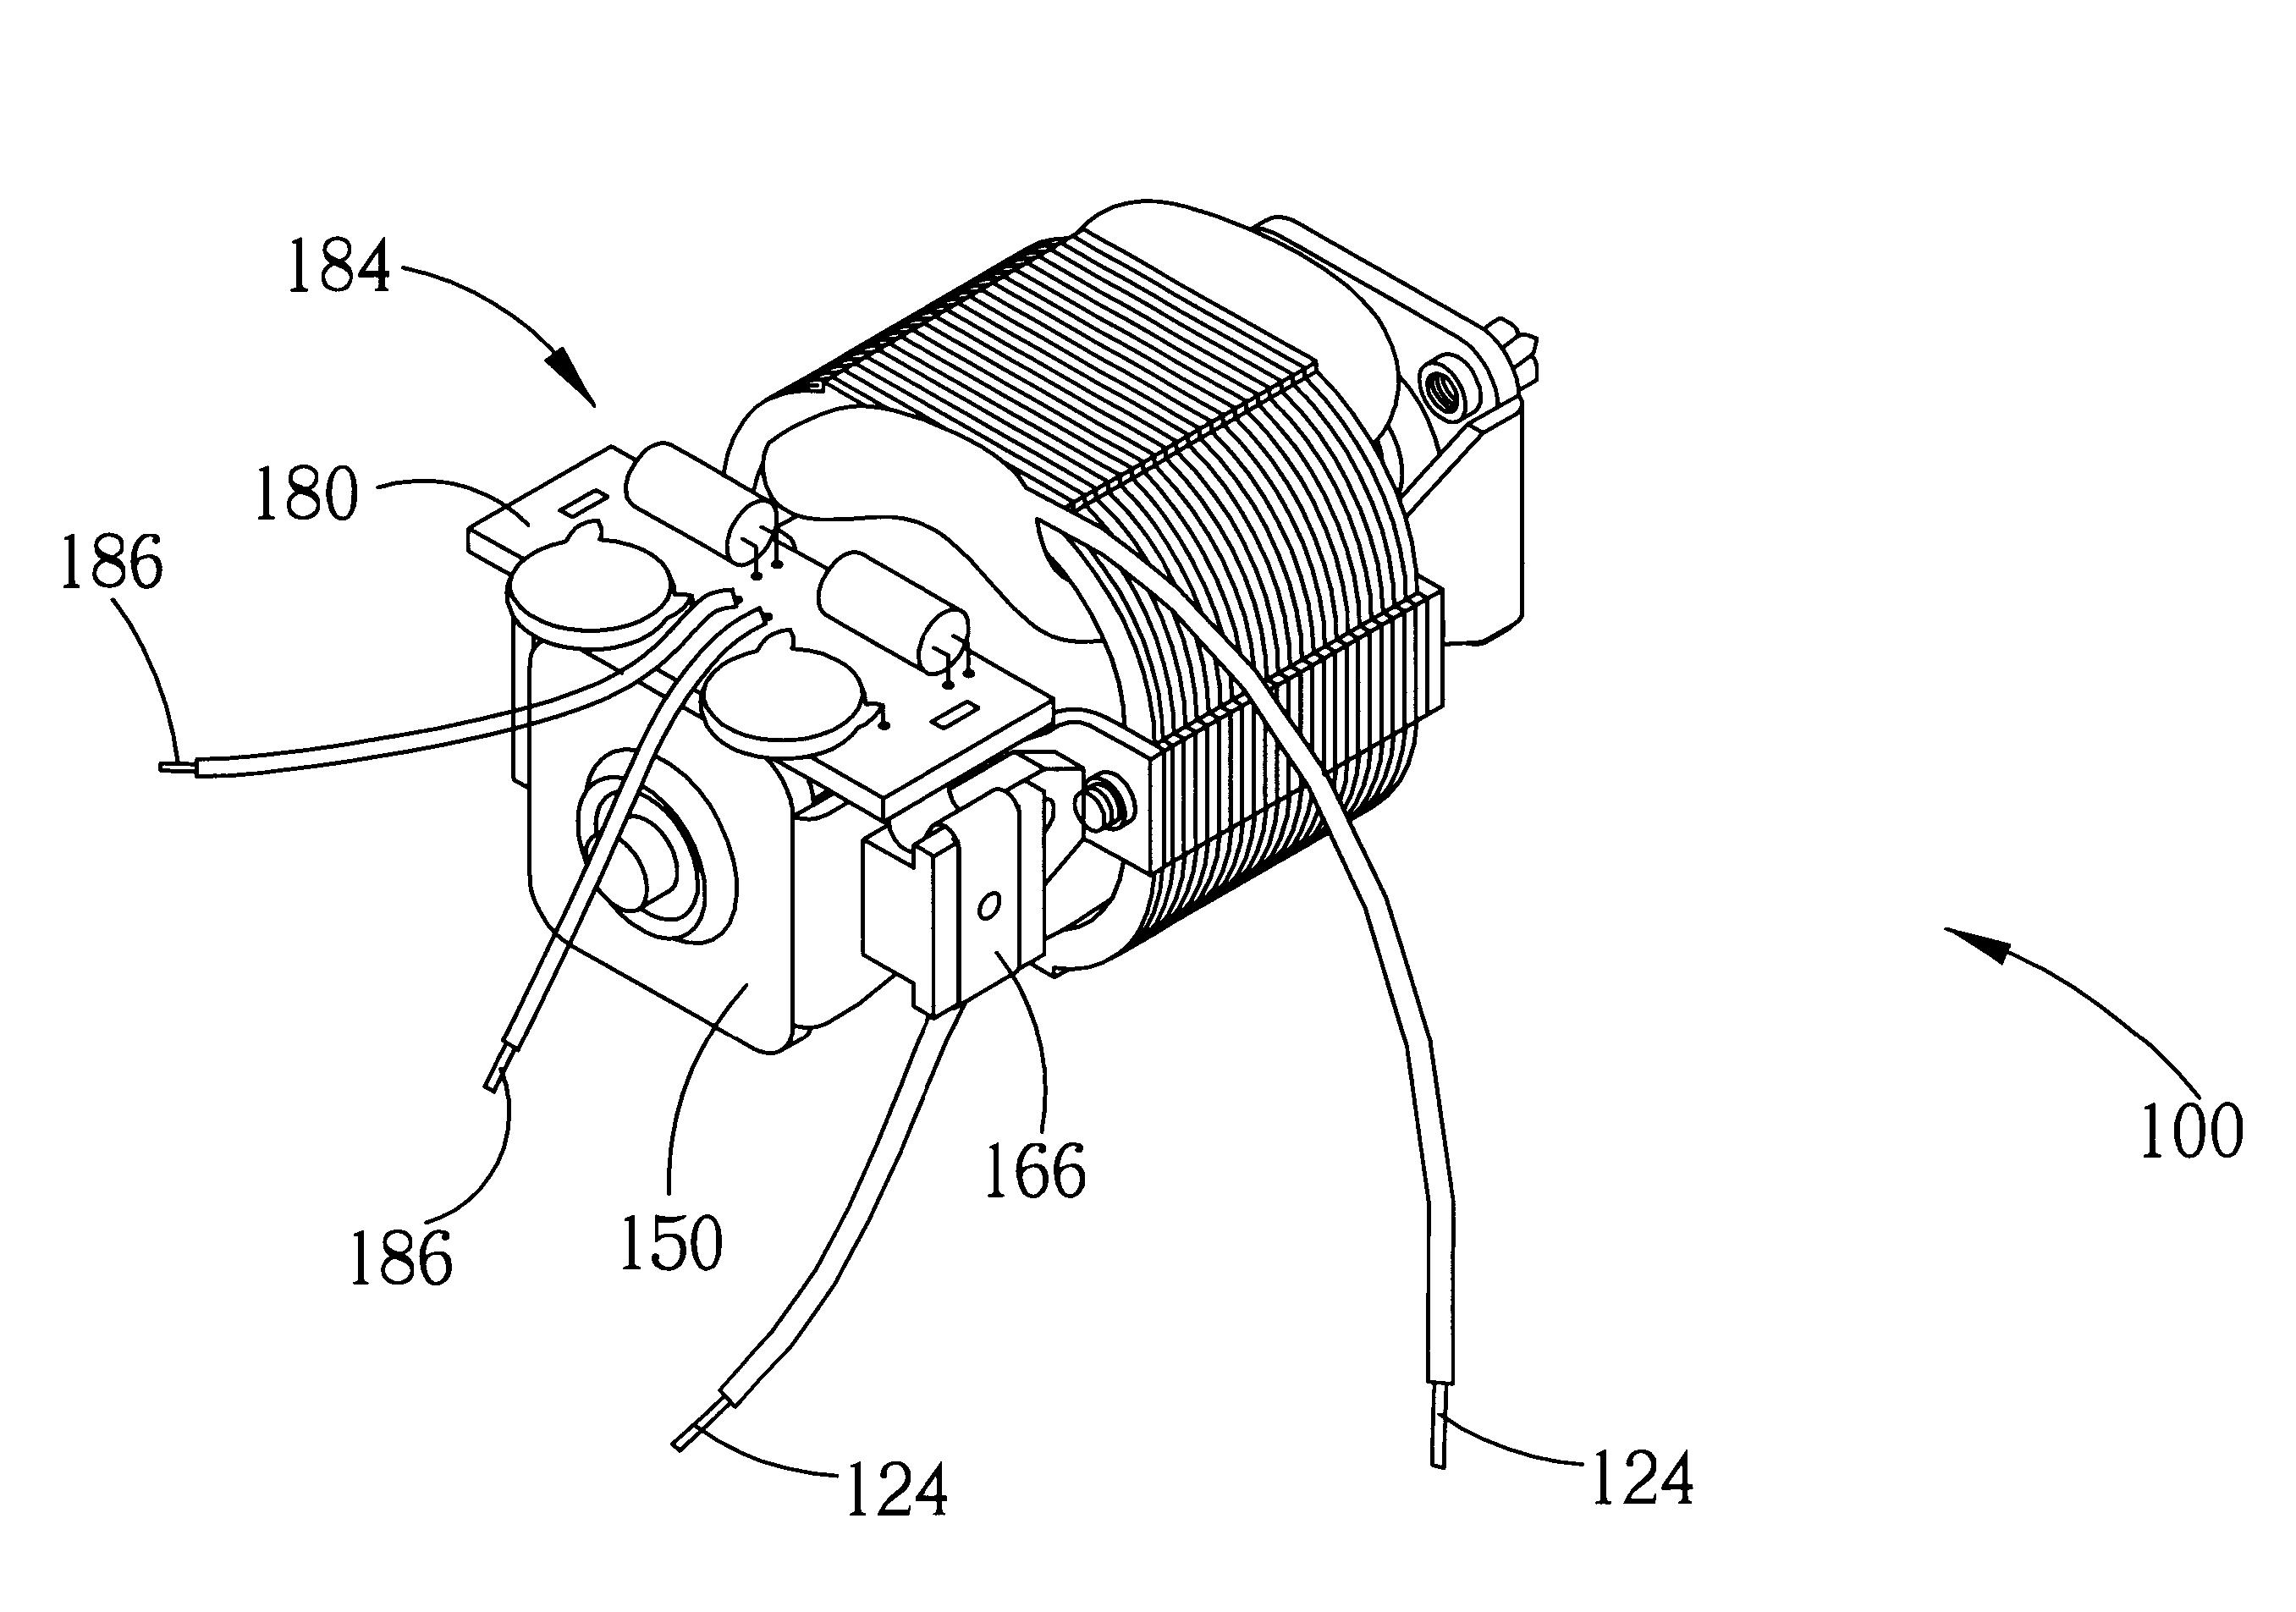 2713x1905 patent us6891304 brush dc motors and ac mutator motor drawing